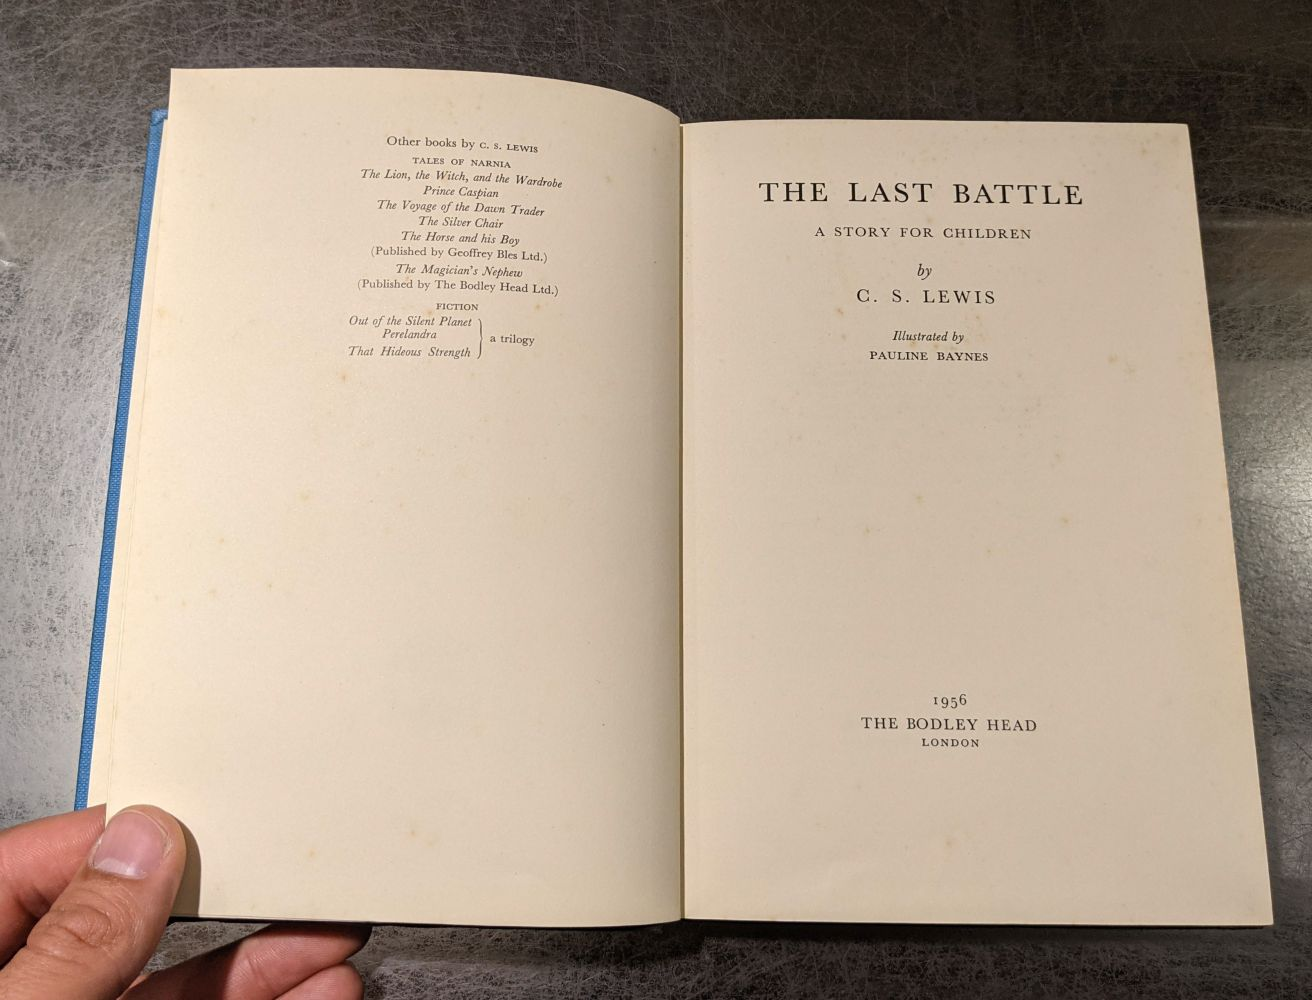 Lewis (C.S.) The Last Battle, 1st edition, 1956 - Image 7 of 9